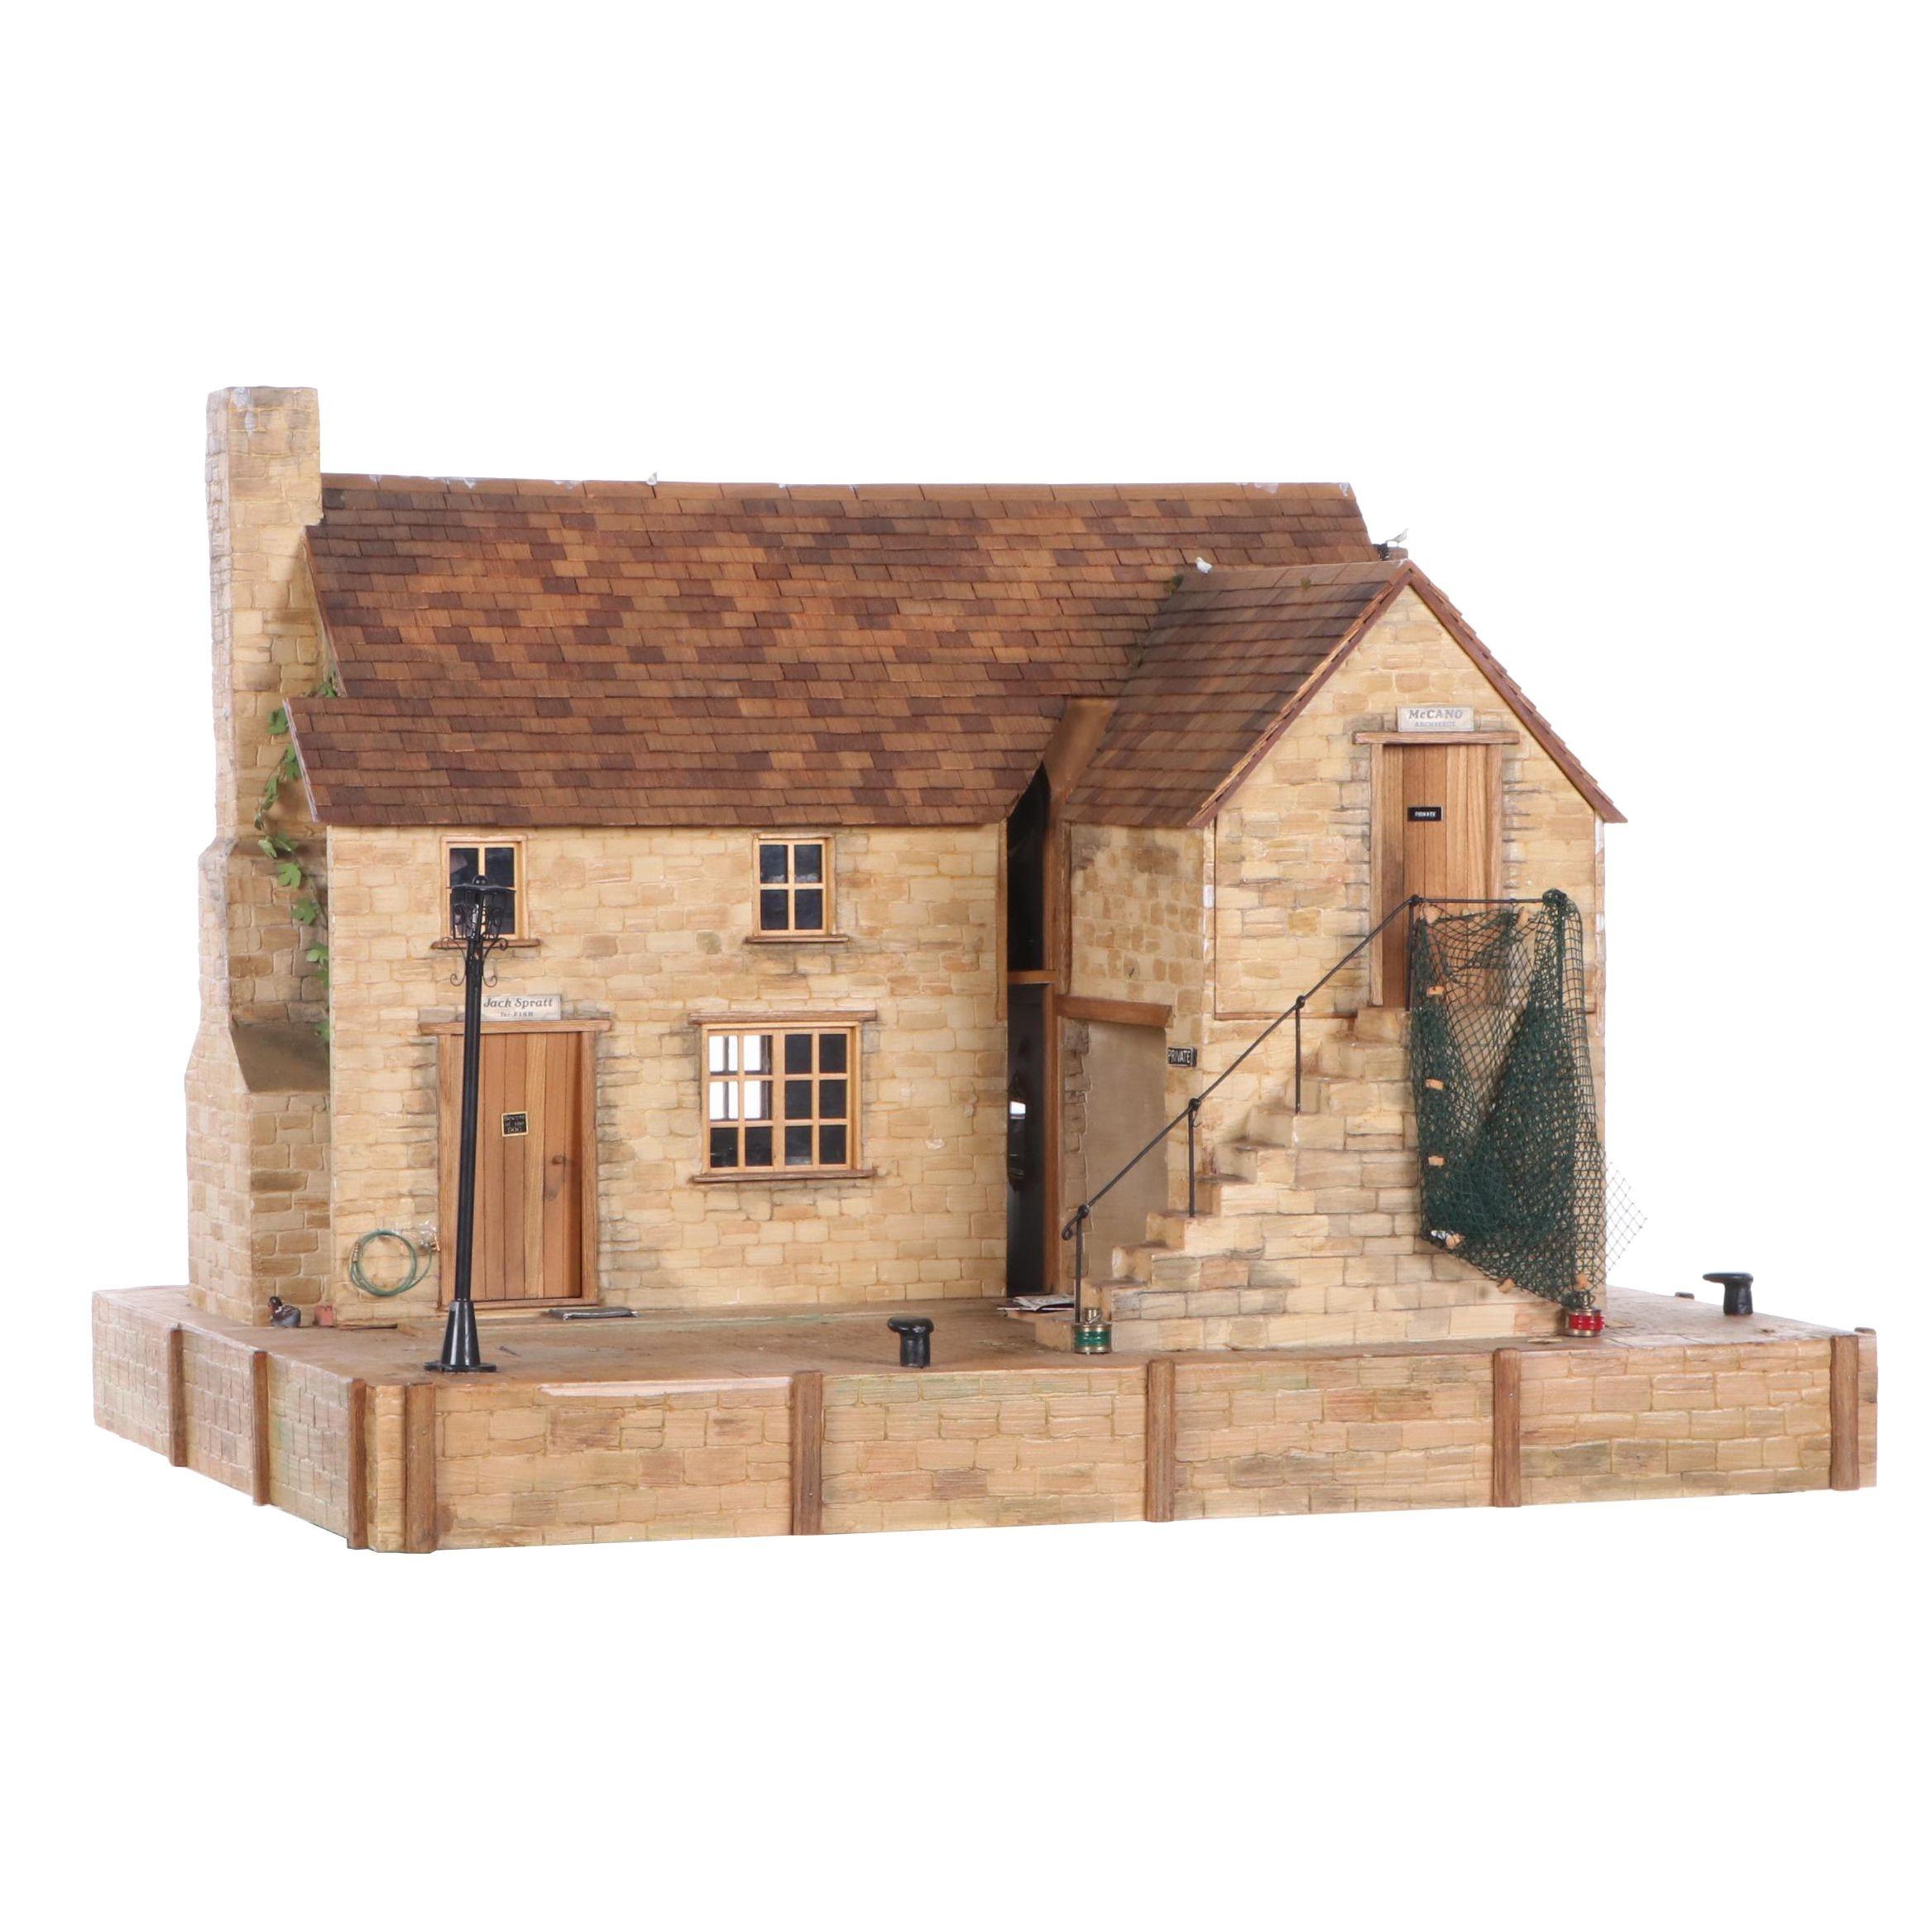 Brian Nichols Furnished Fisherman's Cottage Dollhouse Miniature, 1990